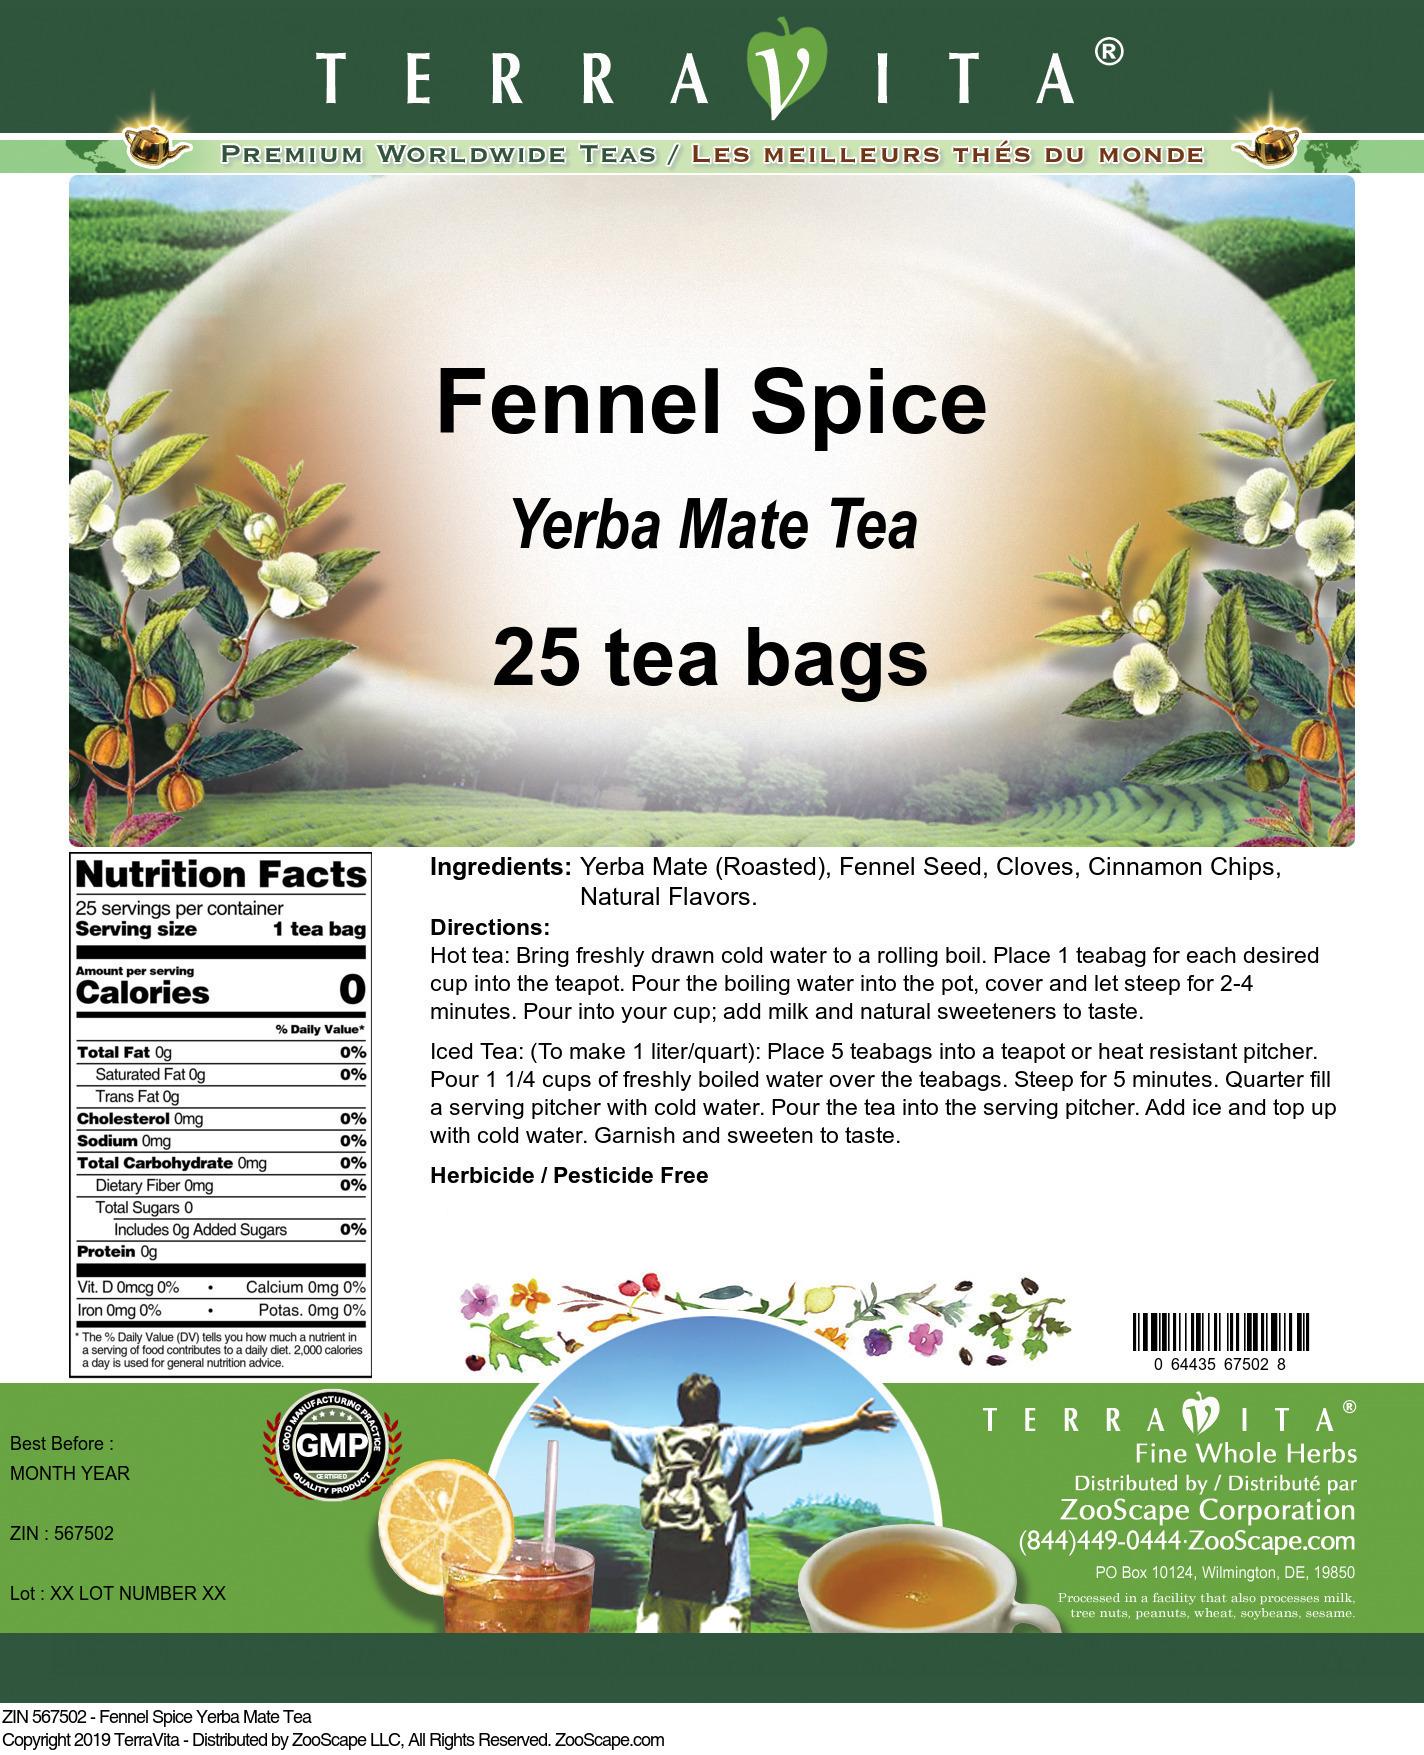 Fennel Spice Yerba Mate Tea